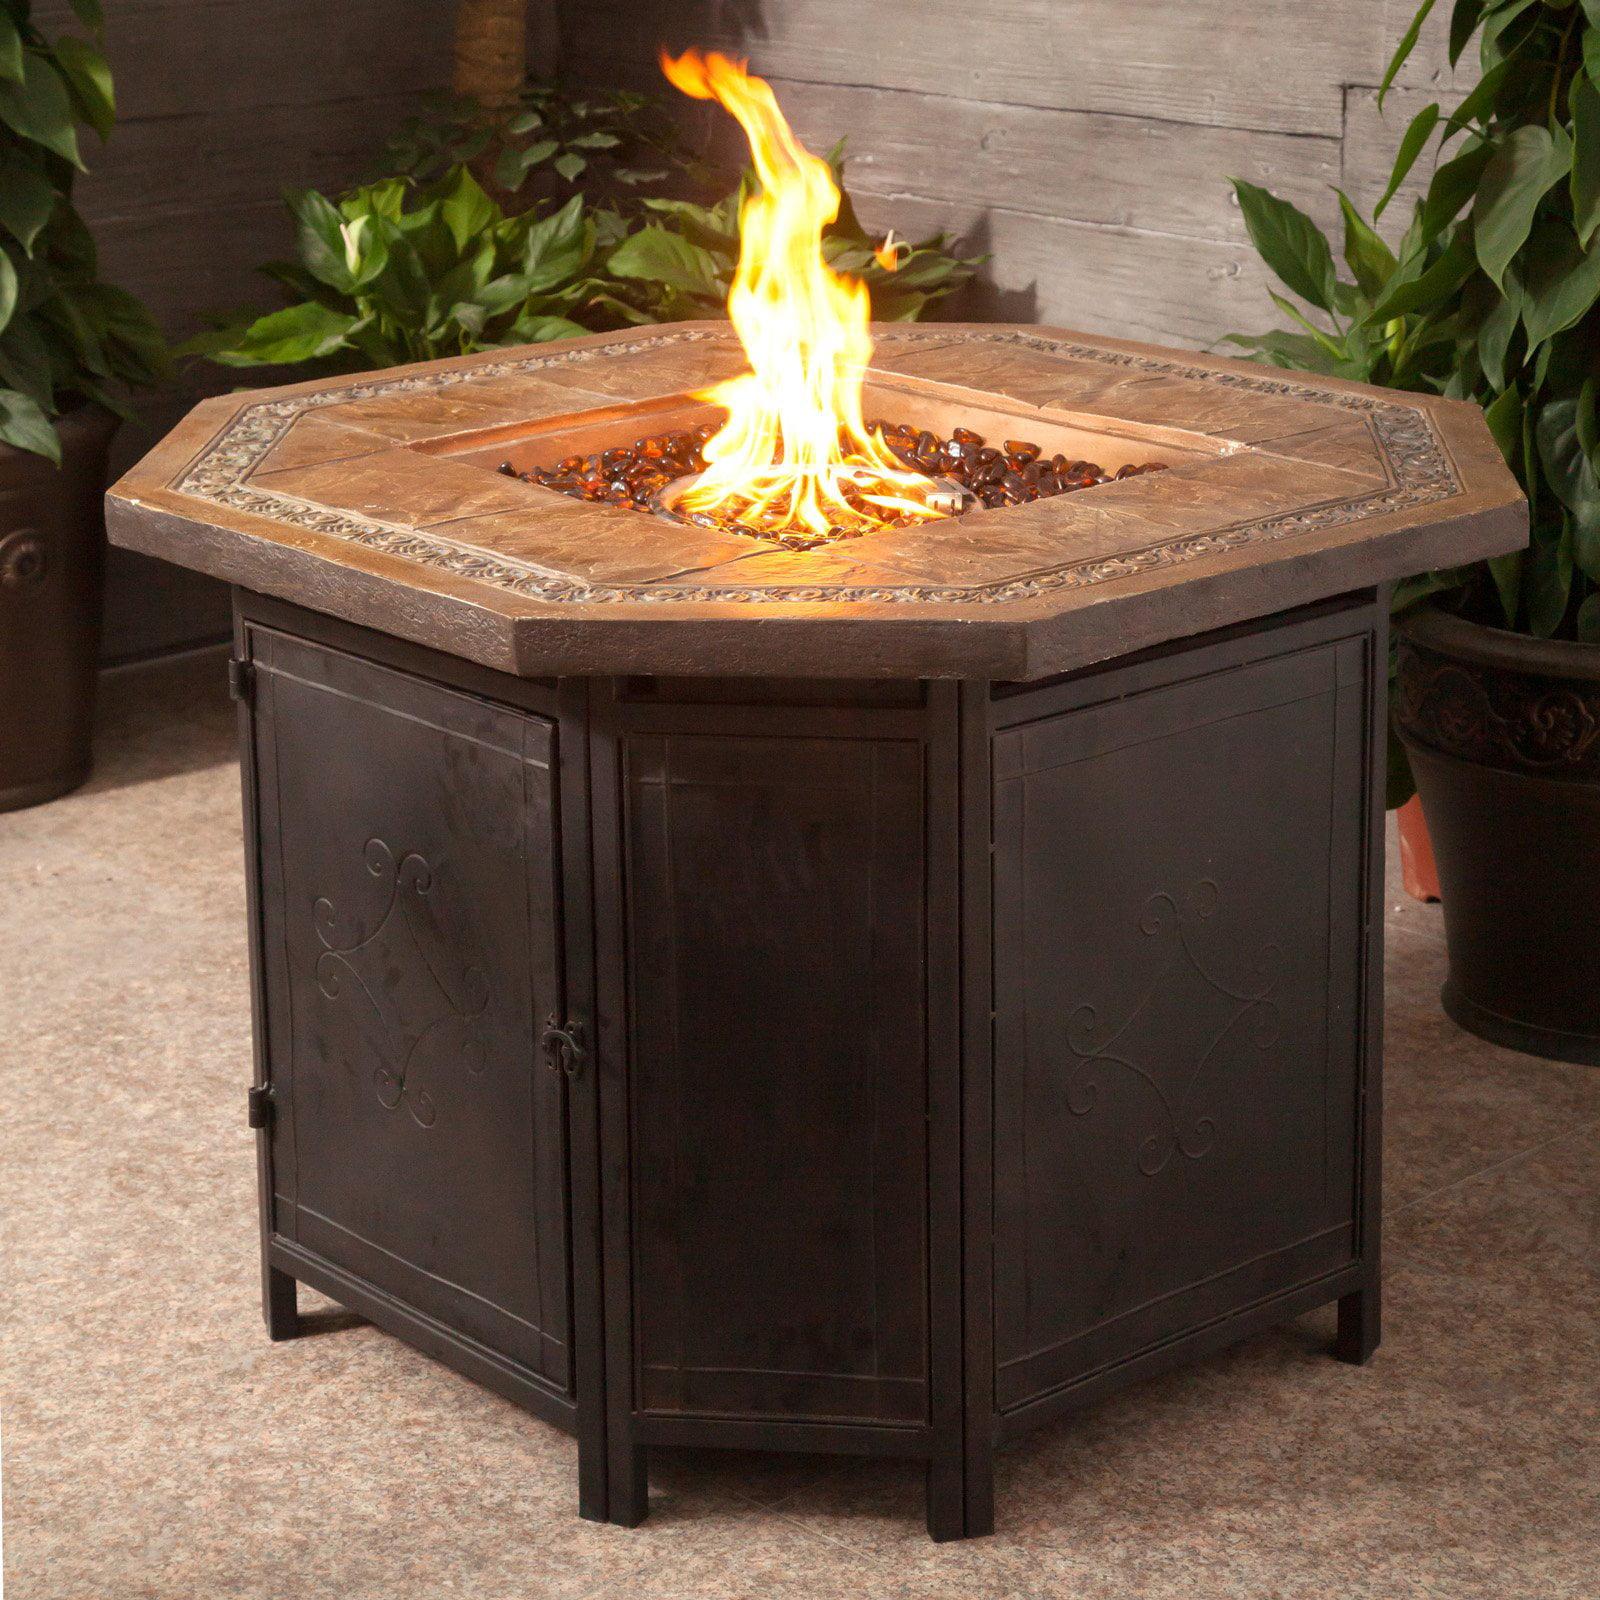 AZ Patio Heaters Faux Stone Octagon Firepit by AZ Patio Heaters